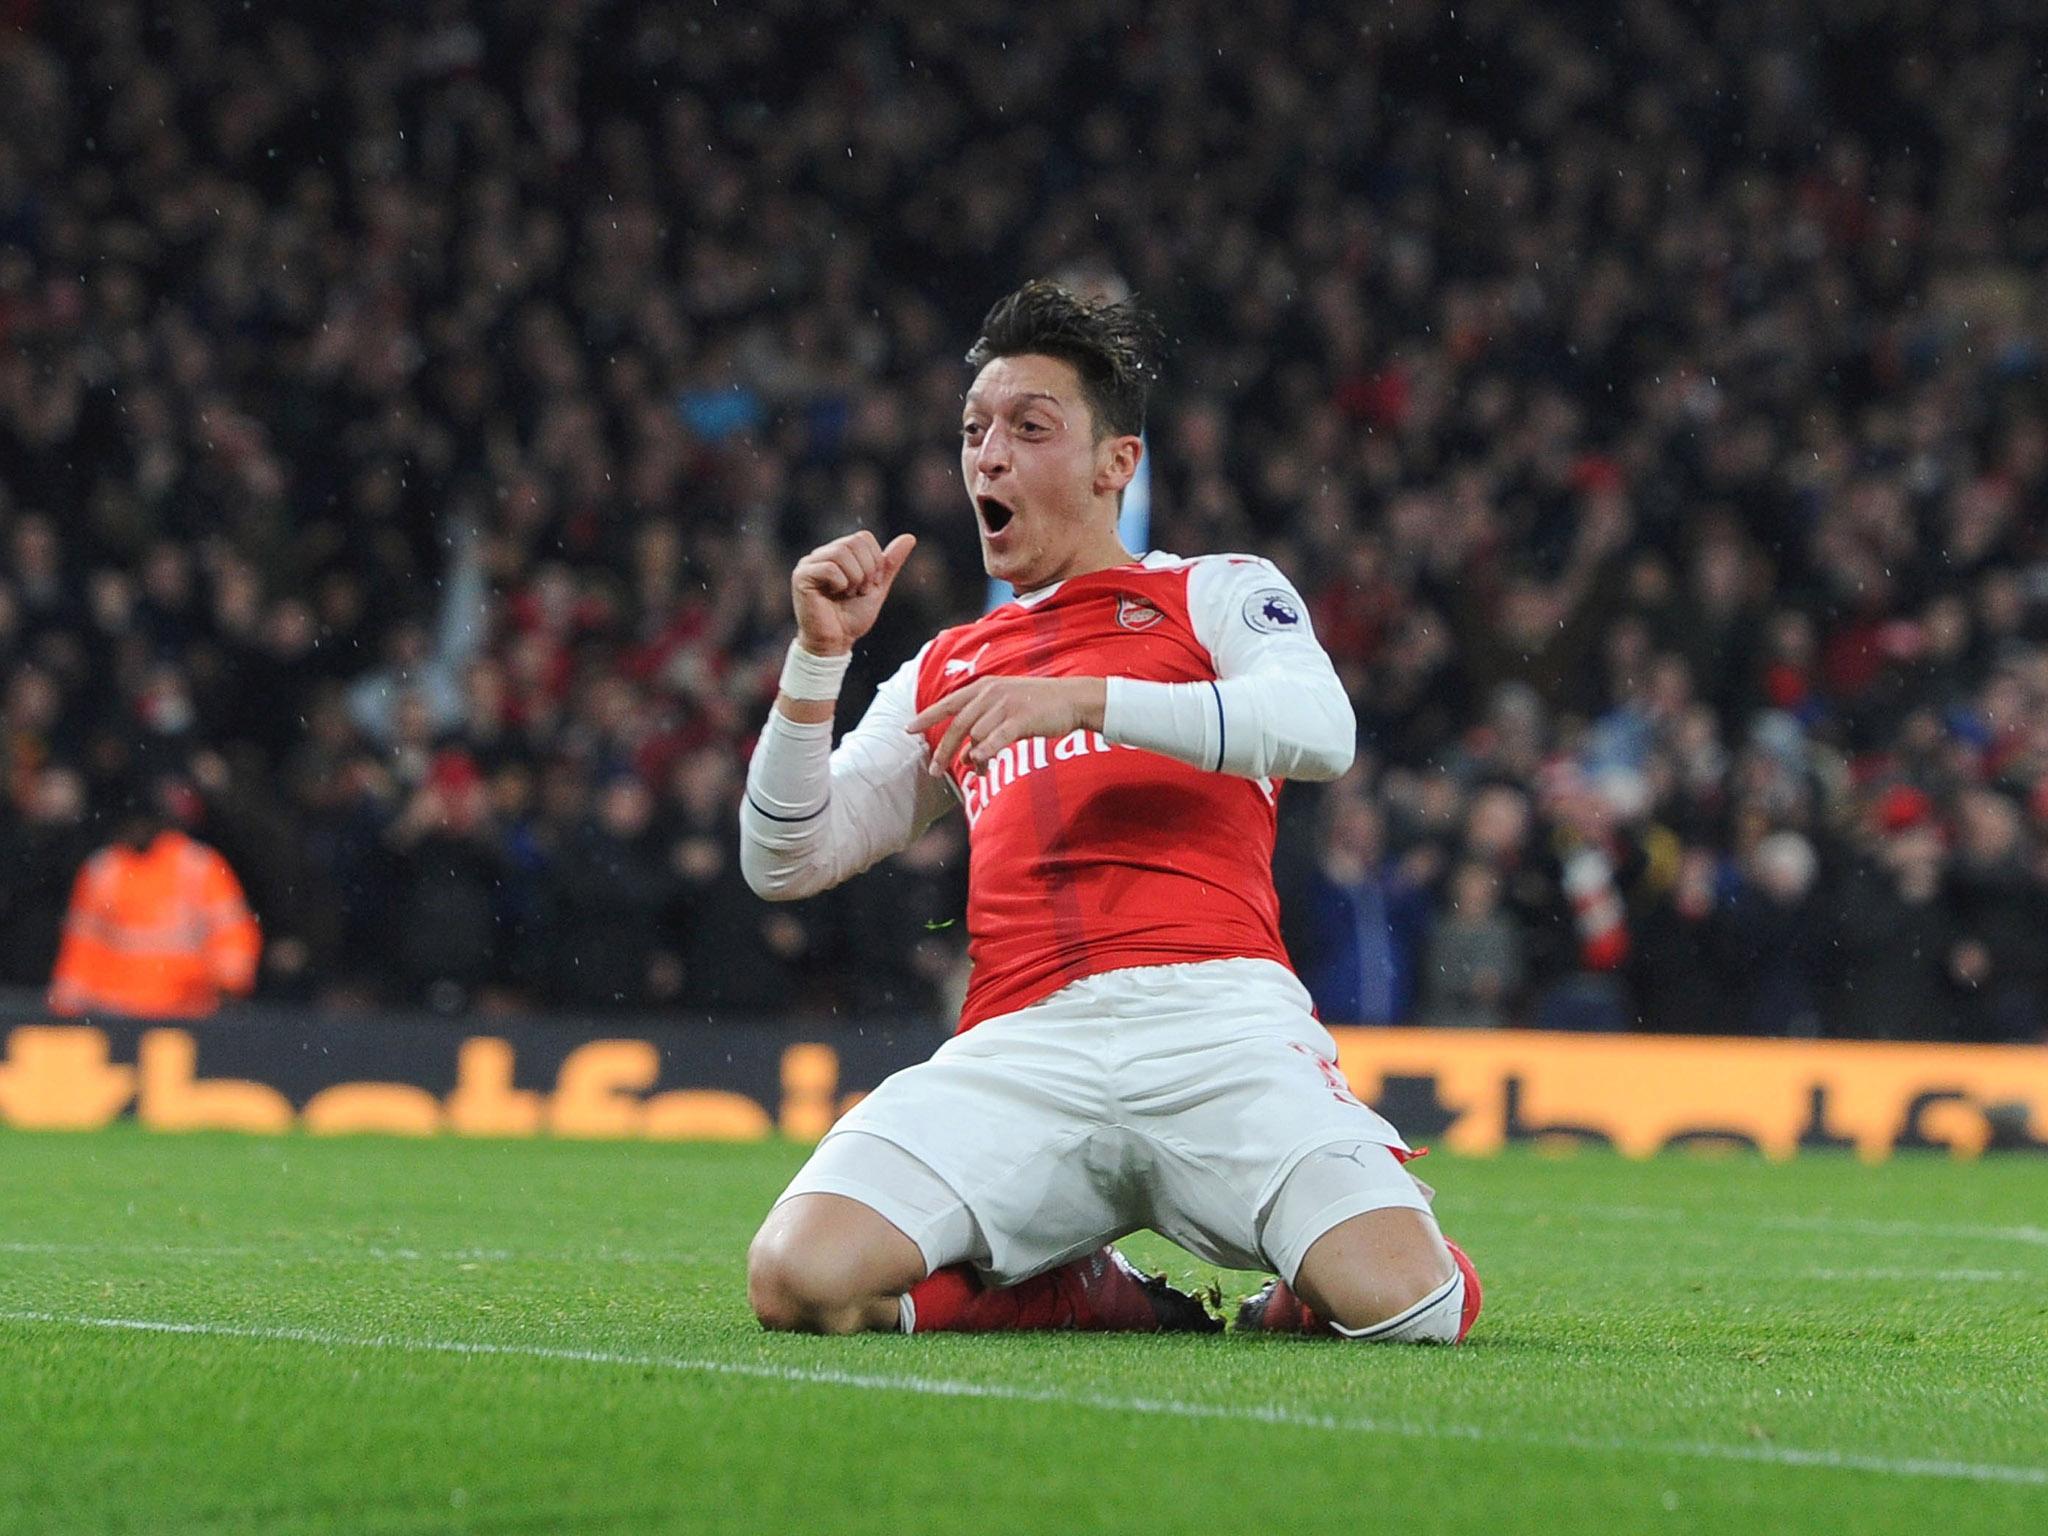 Arsenal Transfer News: Mesut Ozil Says He Is 'very